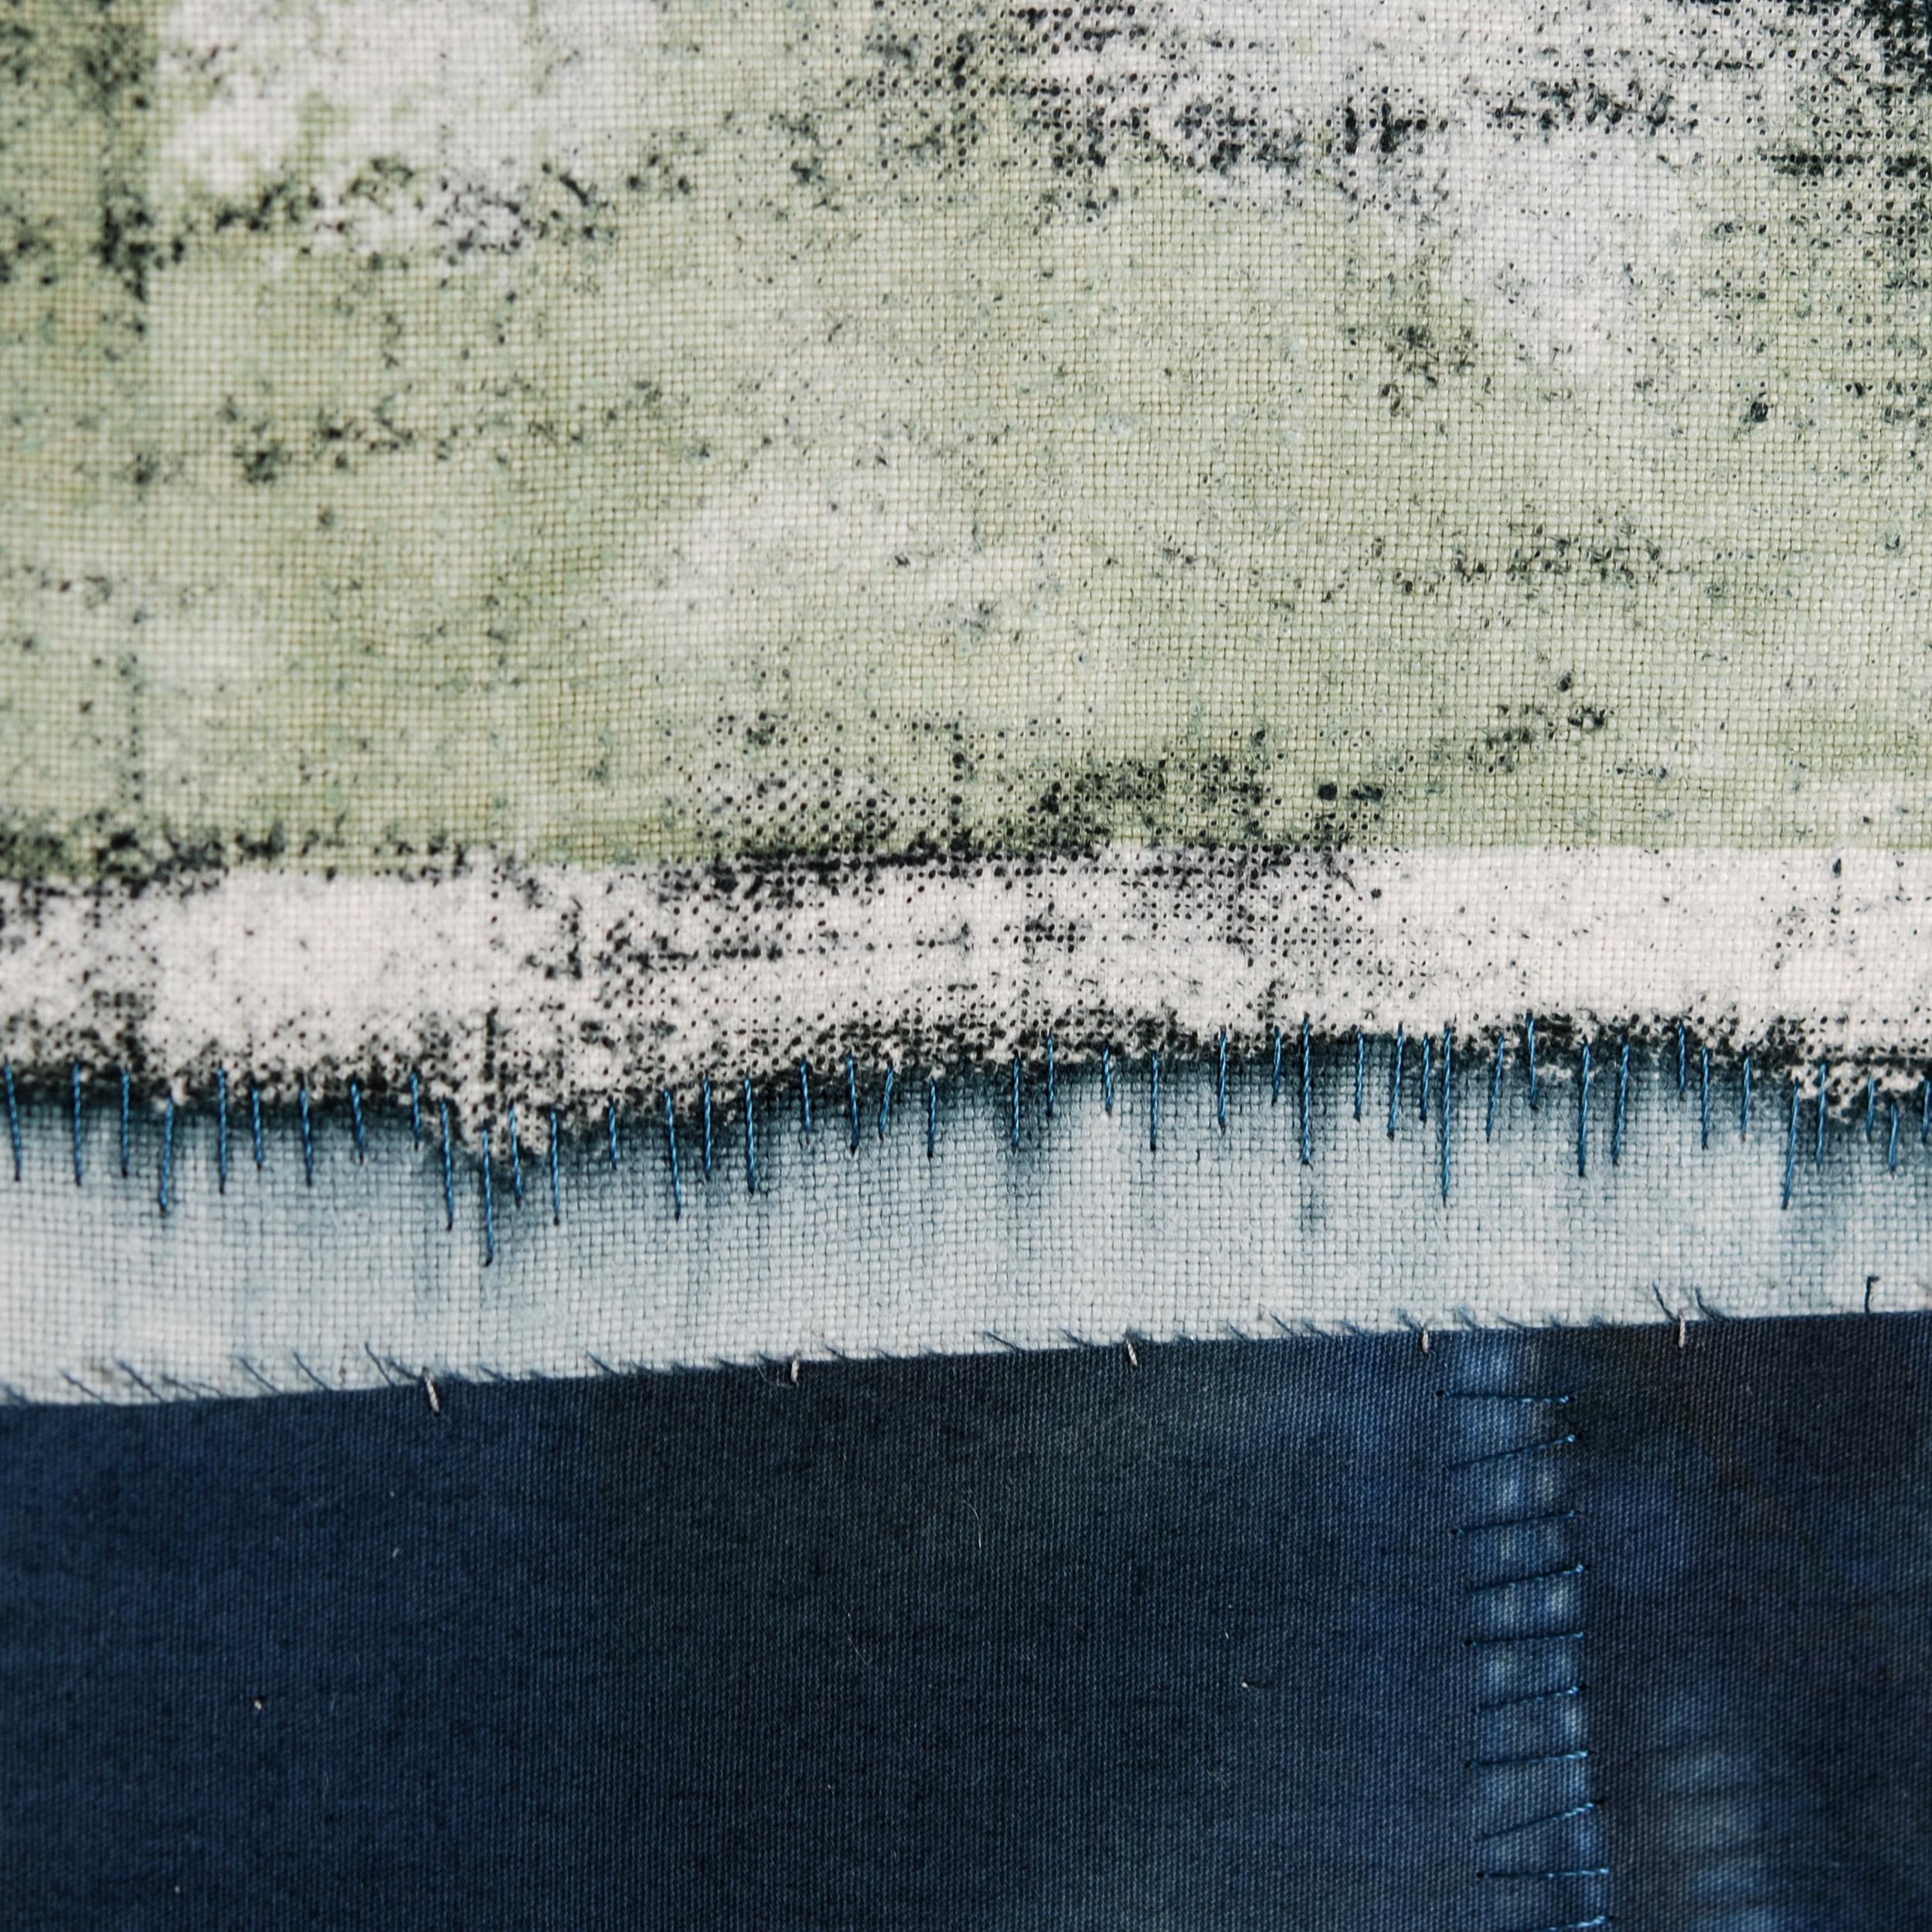 Between the lines 18 (detail)